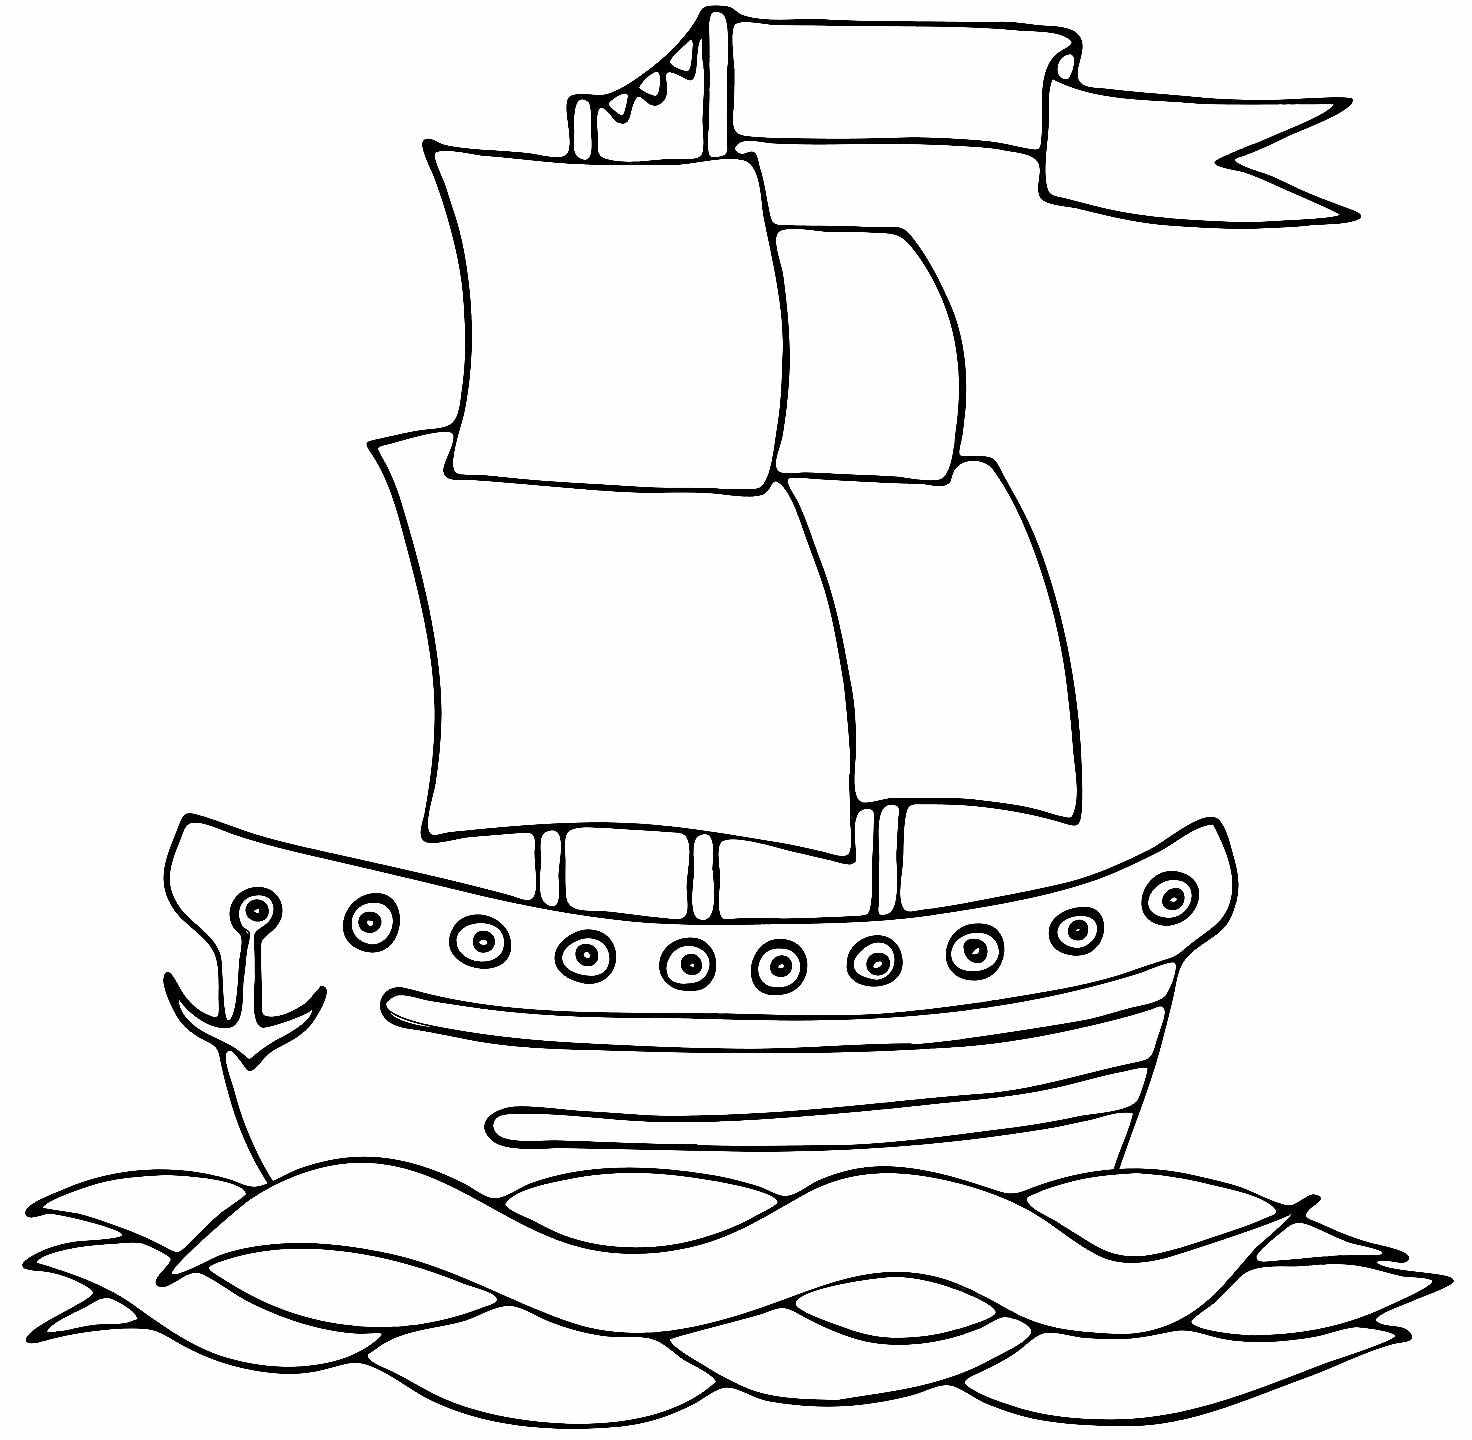 Desenho de barco para colorir